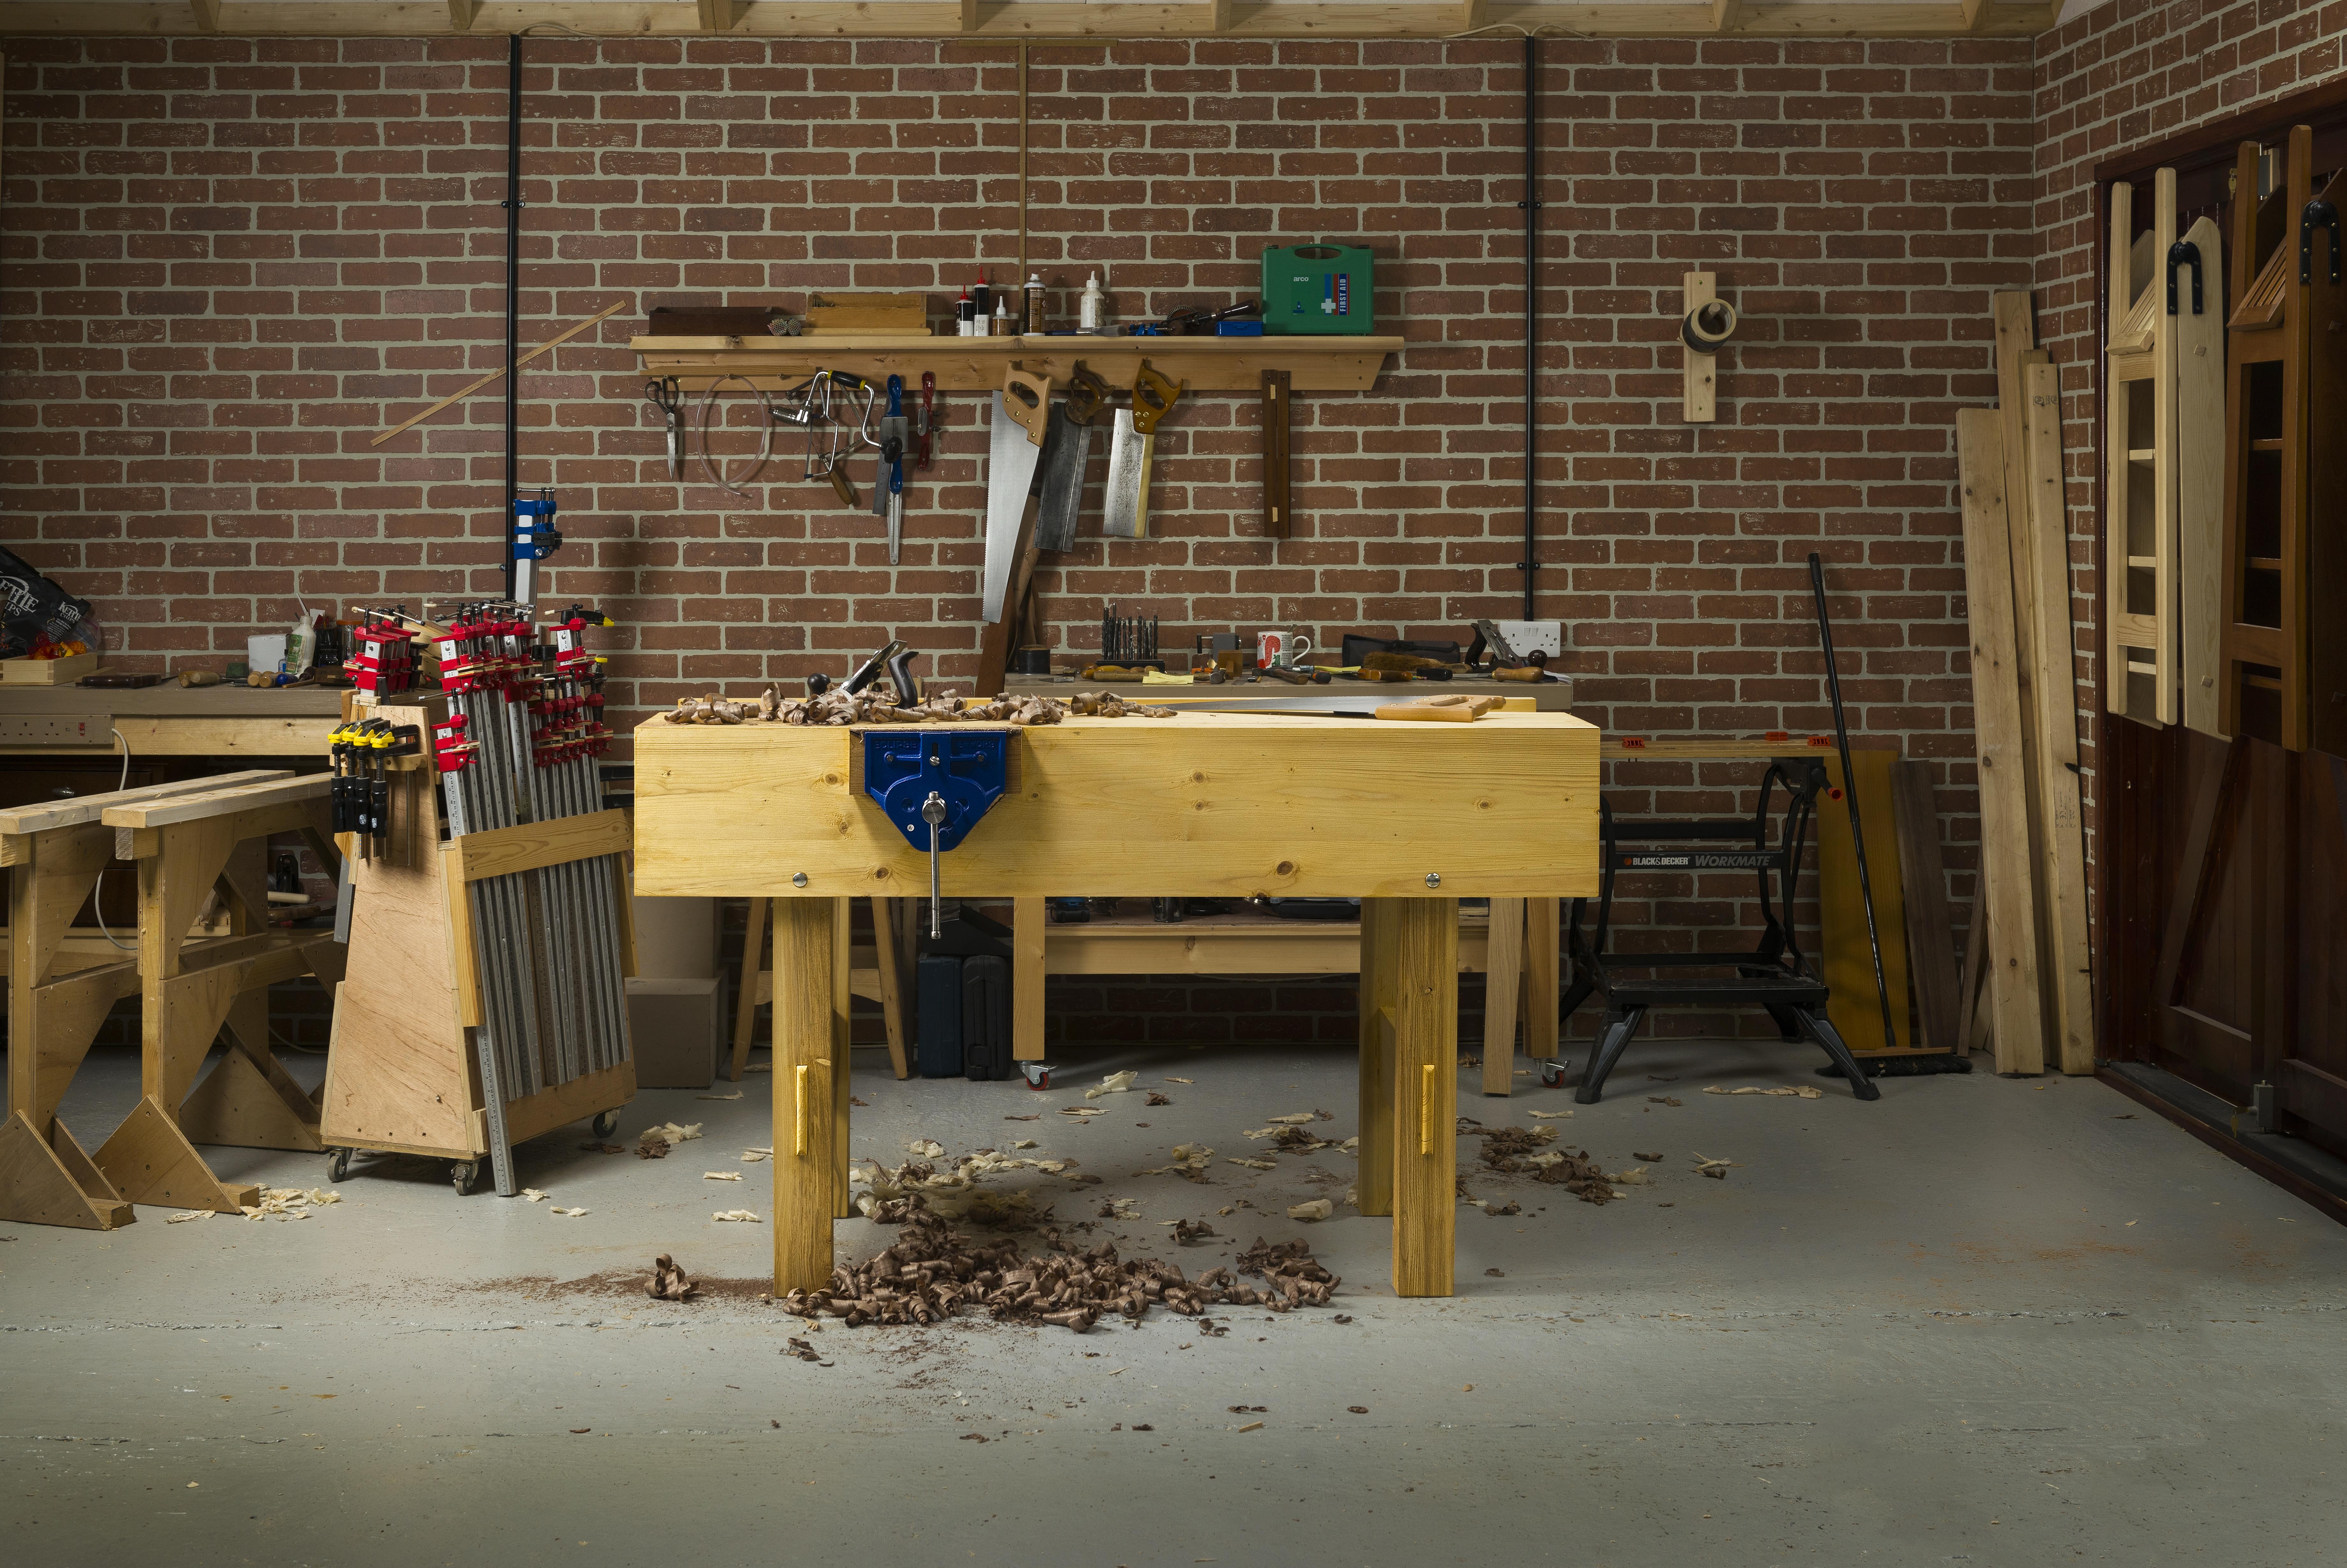 Paul Sellers workbench Photo by Ryan Cowan. Rokesmith Publishing